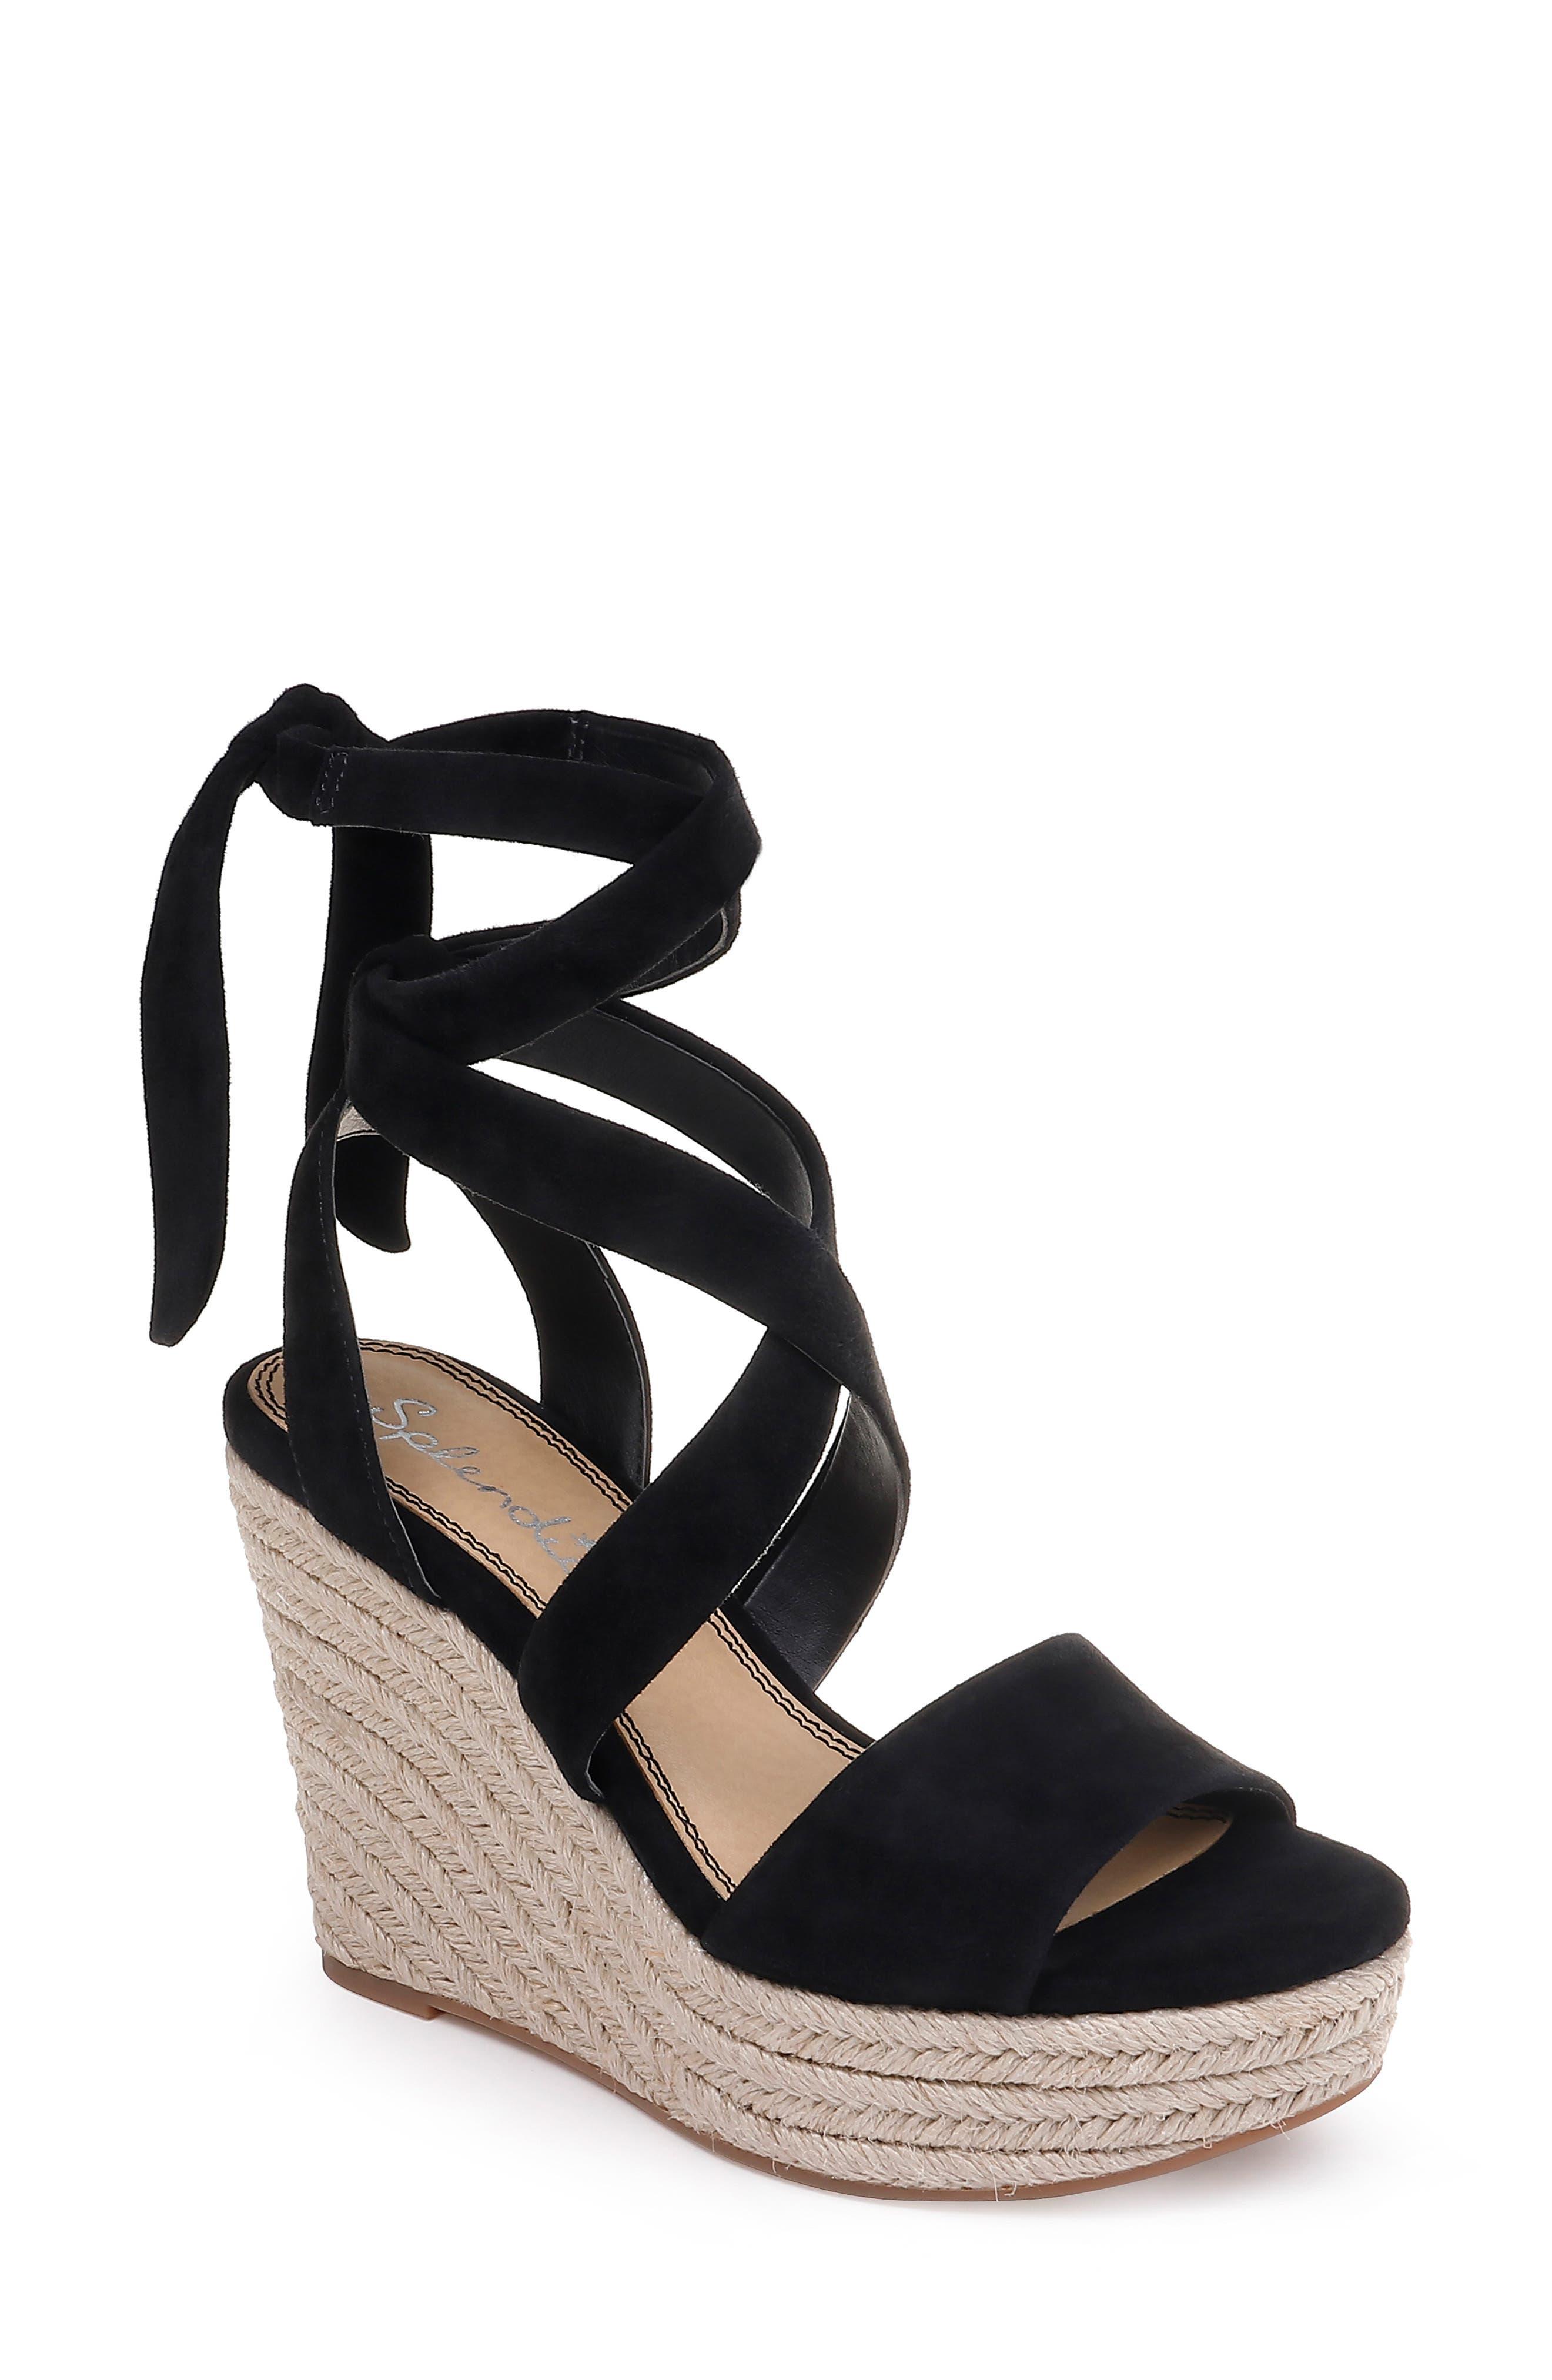 Splendid Tessie Ankle Wrap Wedge Sandal- Black